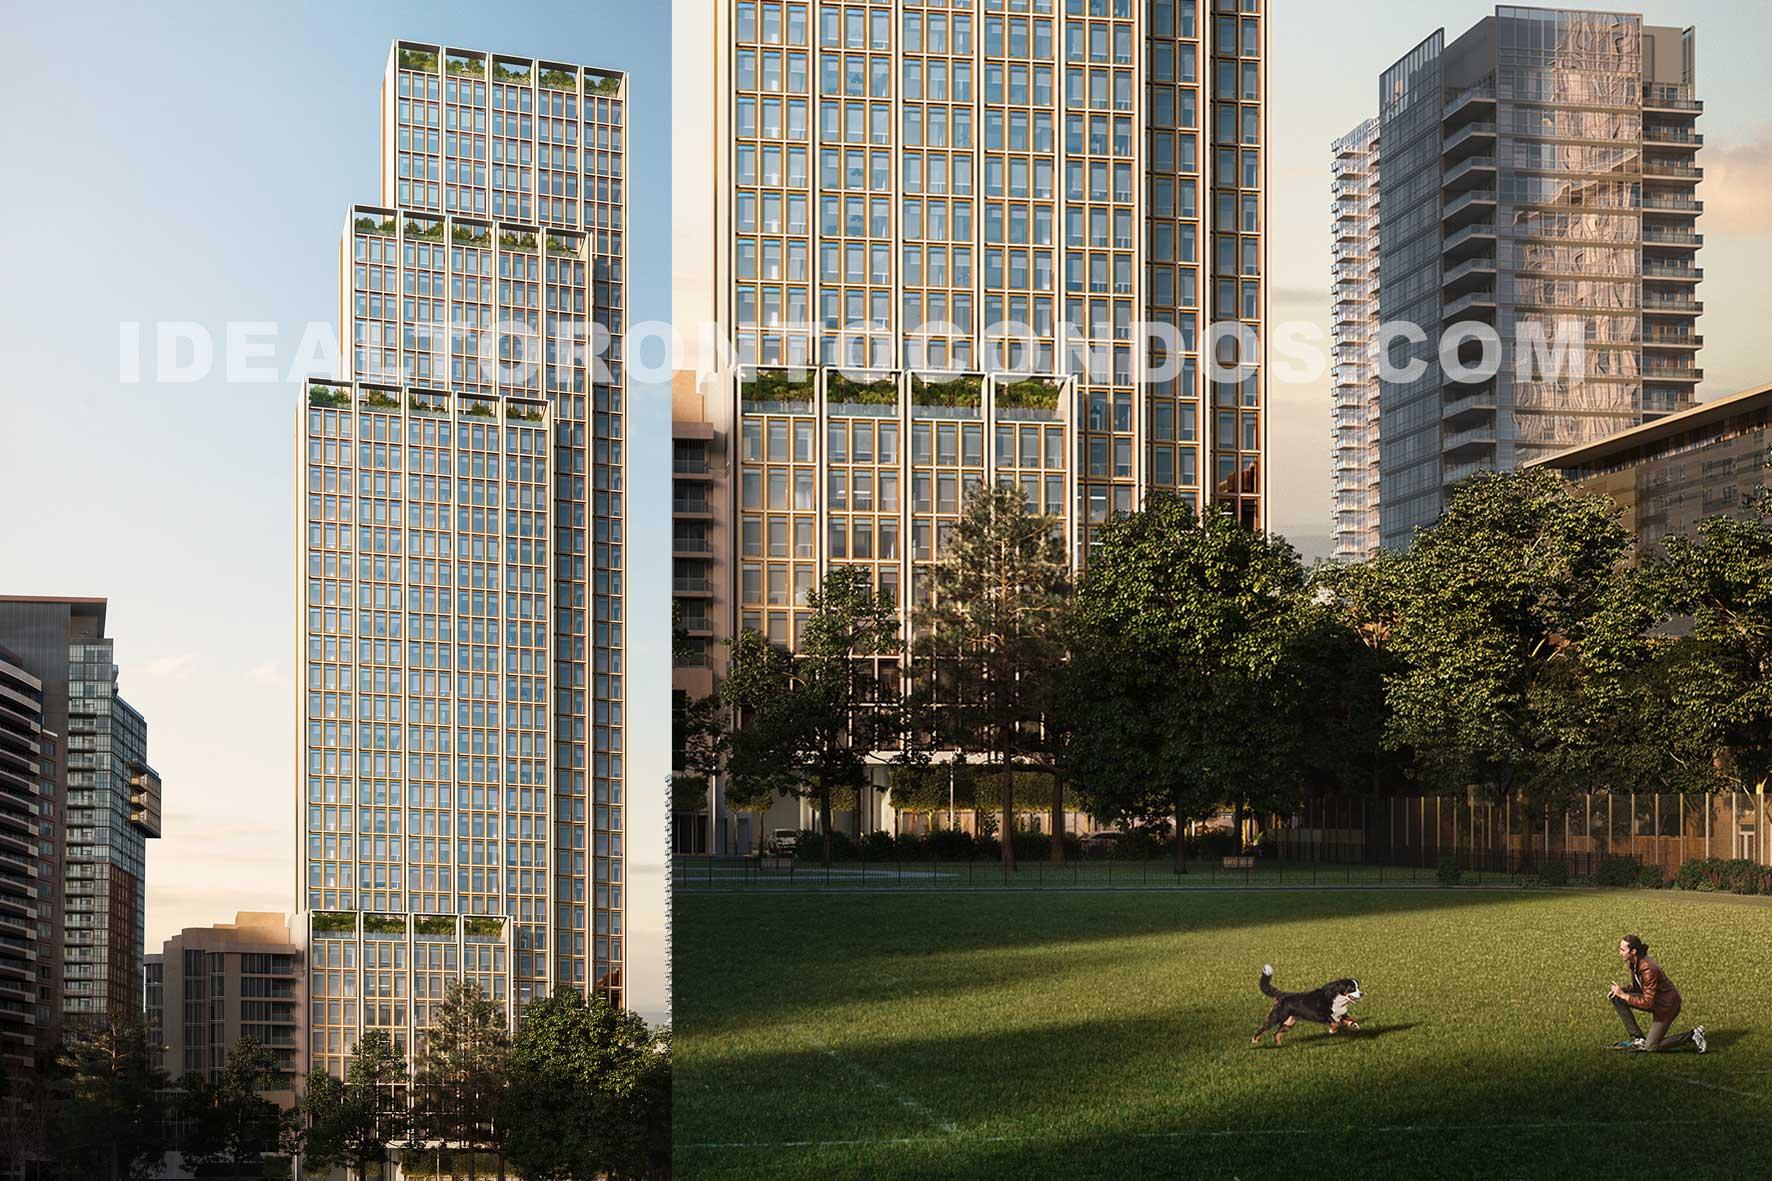 50 SCOLLARD building